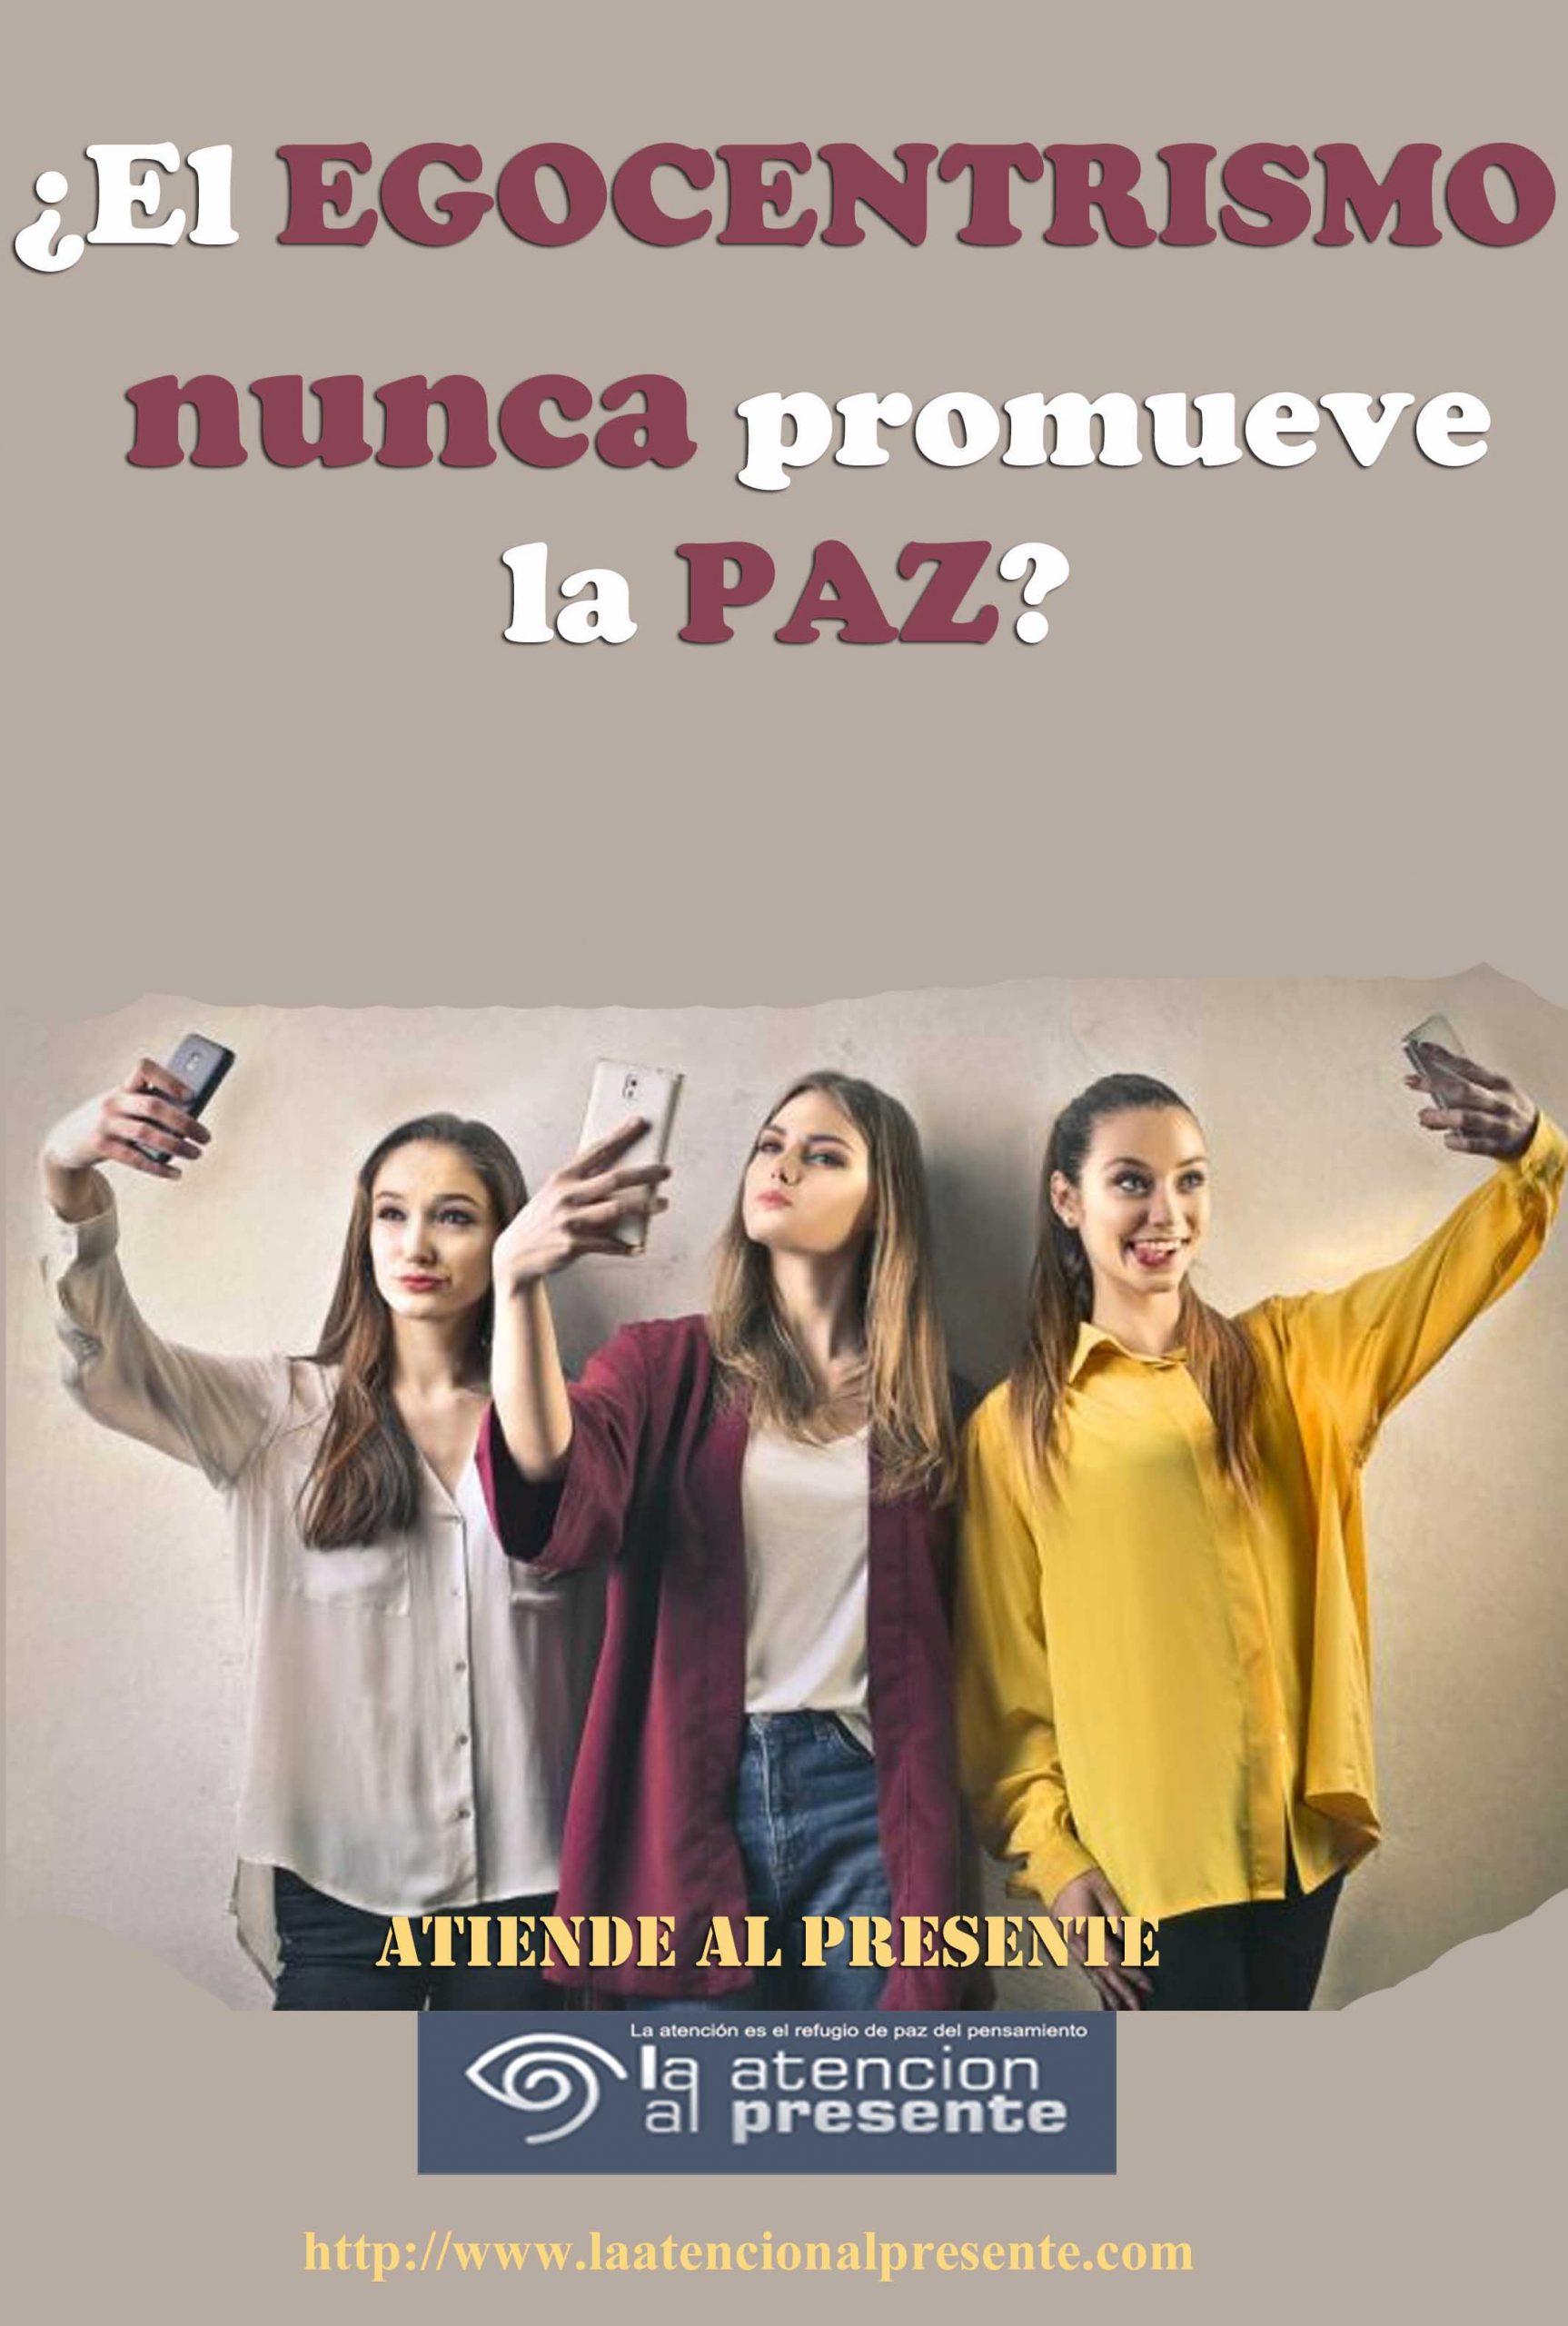 23 de marzo ISA El EGOCENTRISMO nunca promueve la PAZ min scaled